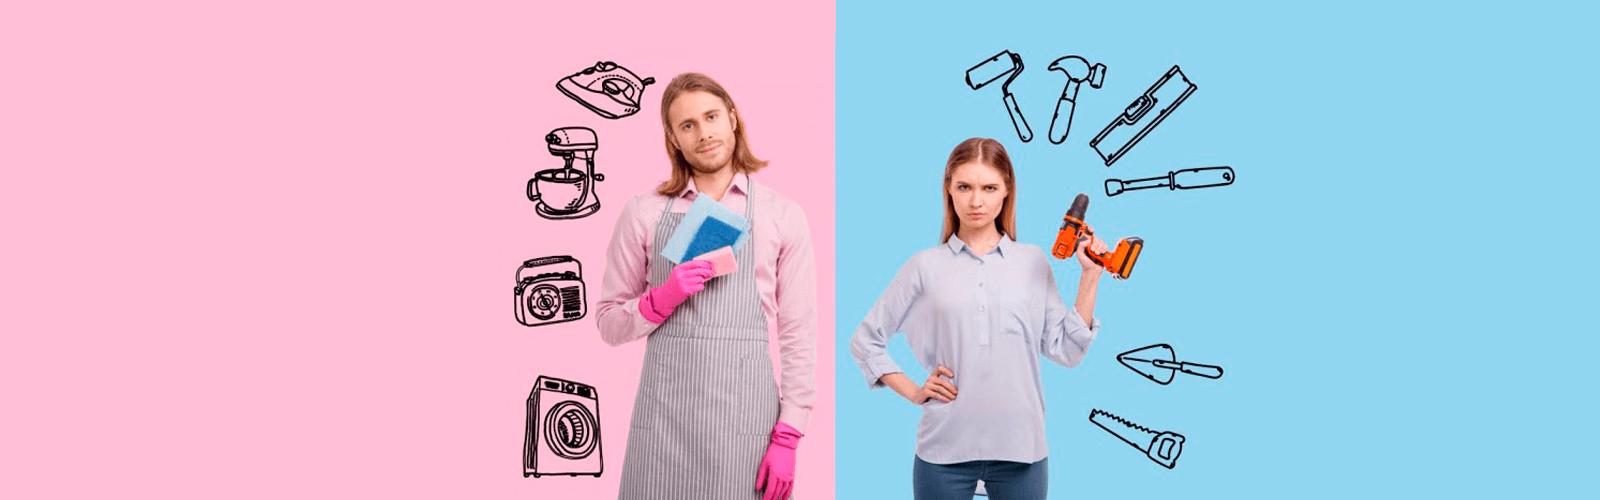 Ошибки в поведении мужчин и женщин